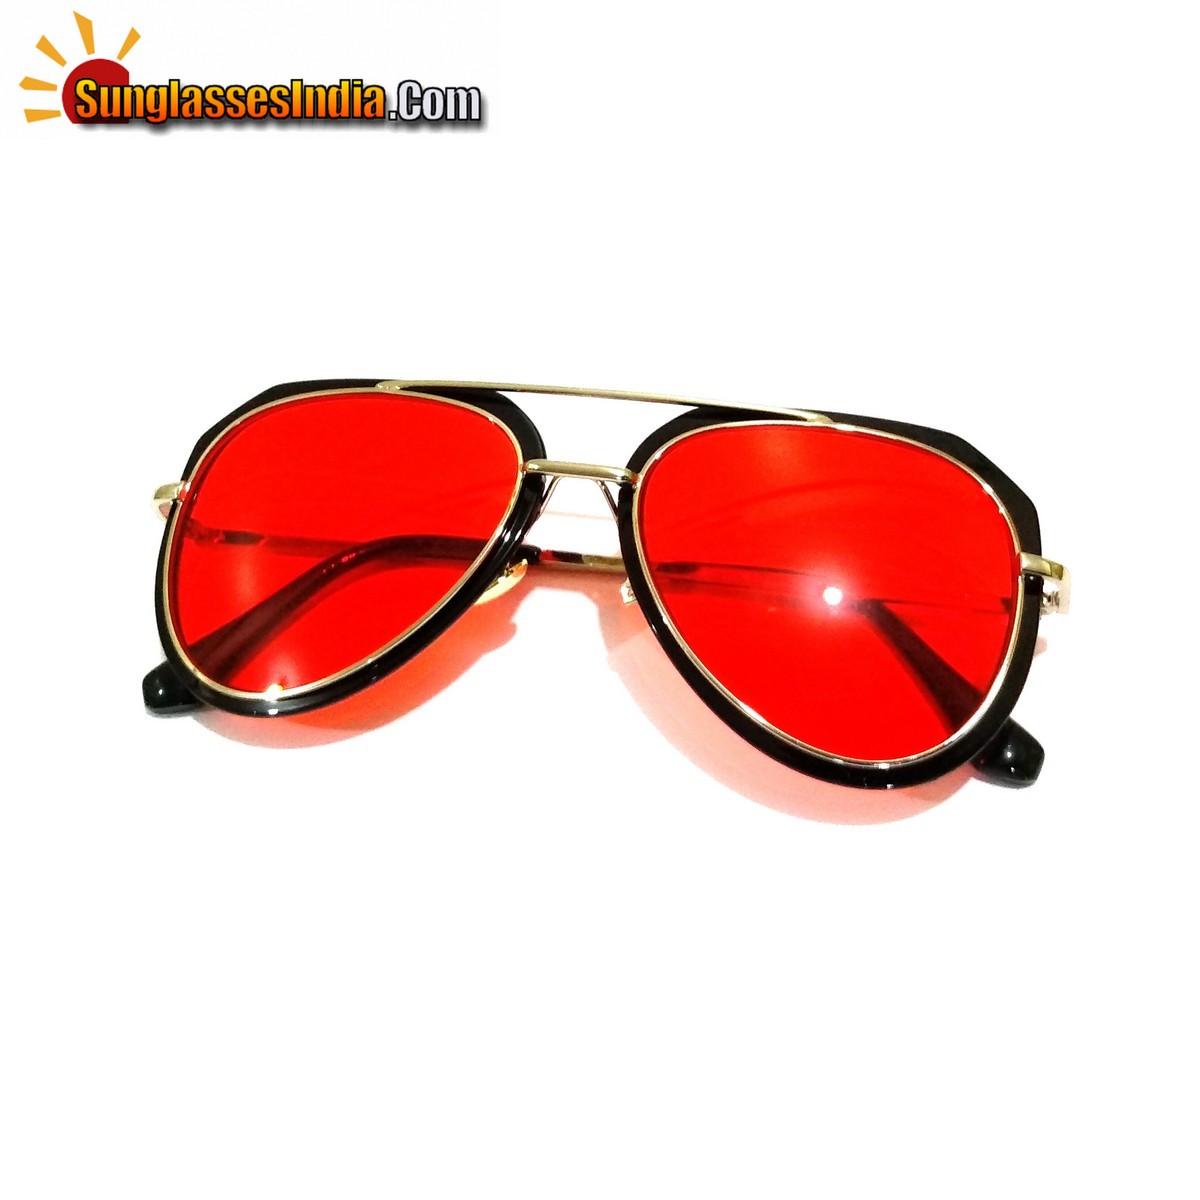 Red Lens Trendy Club Sunglasses Night Driving Sunglasses Tik Tok Video Sunglasses